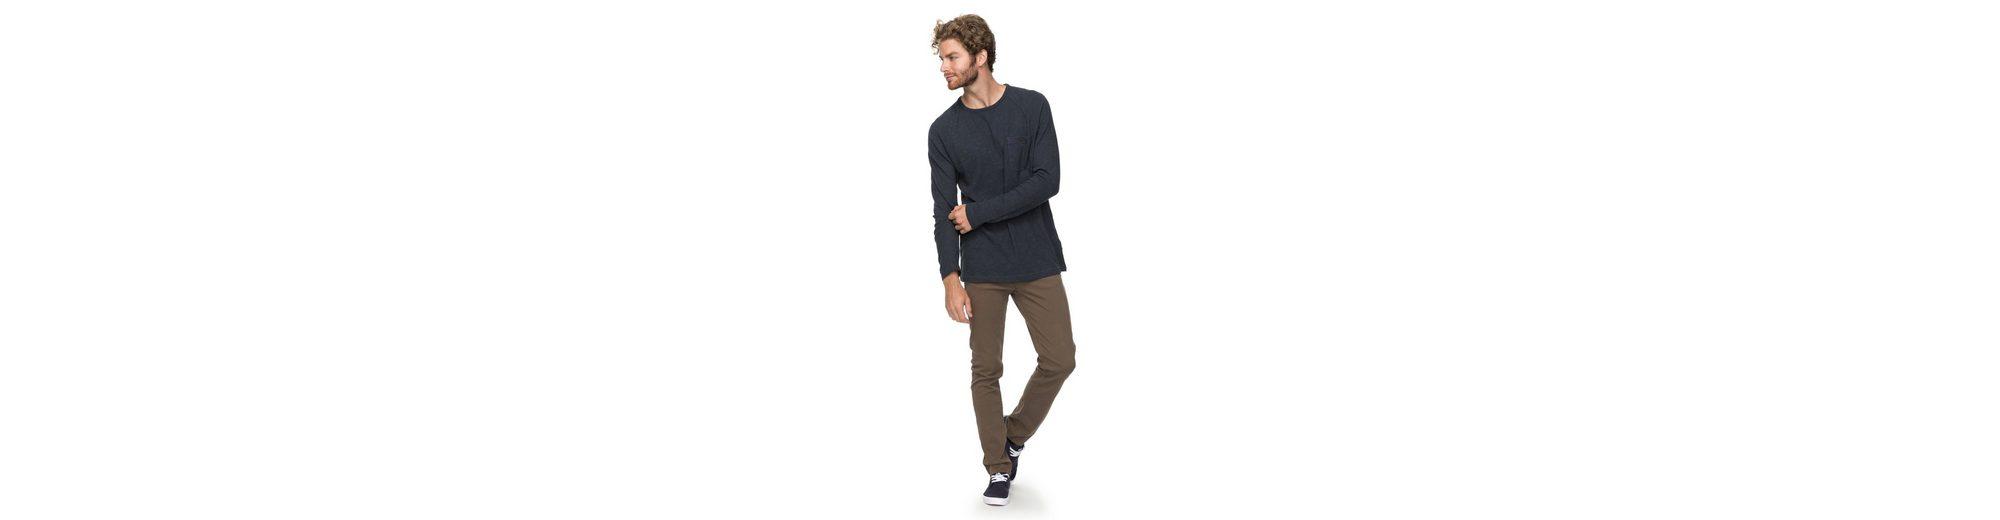 Quiksilver Sweatshirt Low Tide Bekommt Einen Rabatt Zu Kaufen 7WHtChxk3